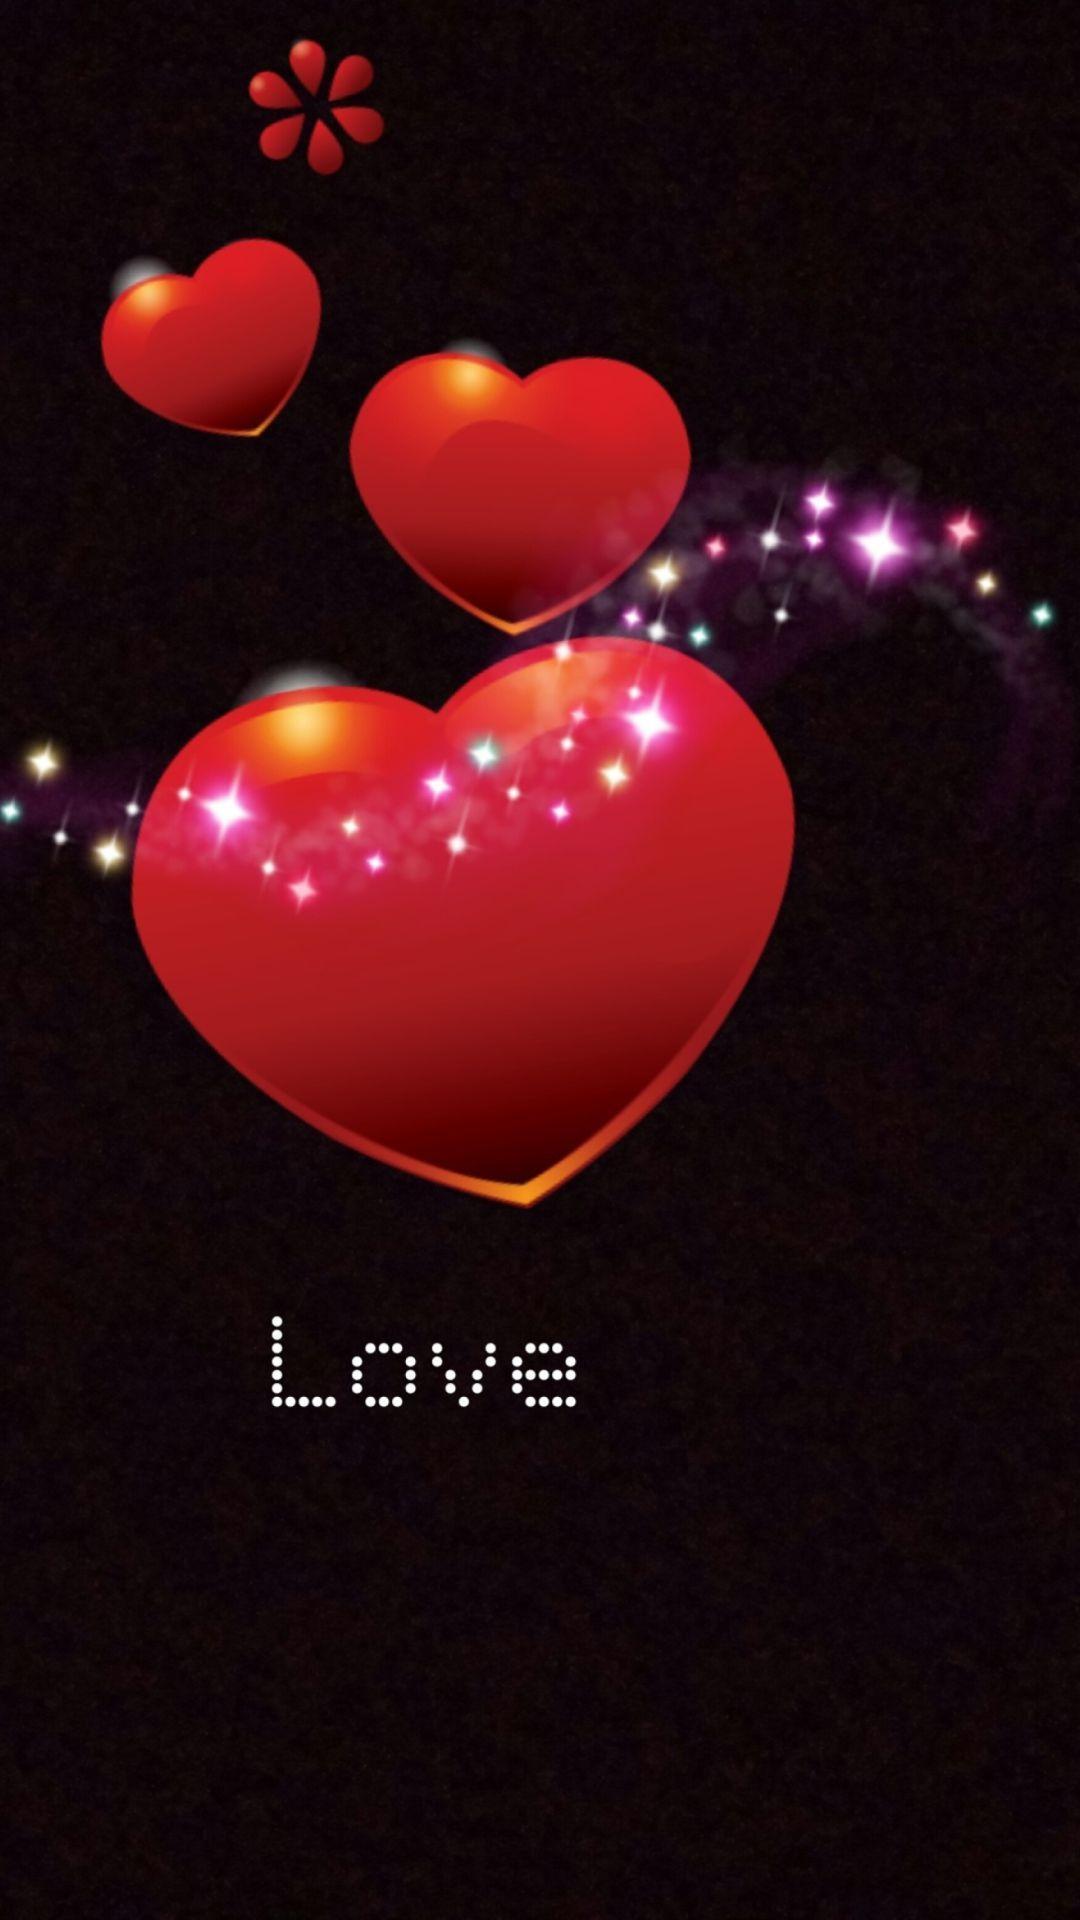 Love Beautiful Wallpaper Android Download Flip Wallpapers